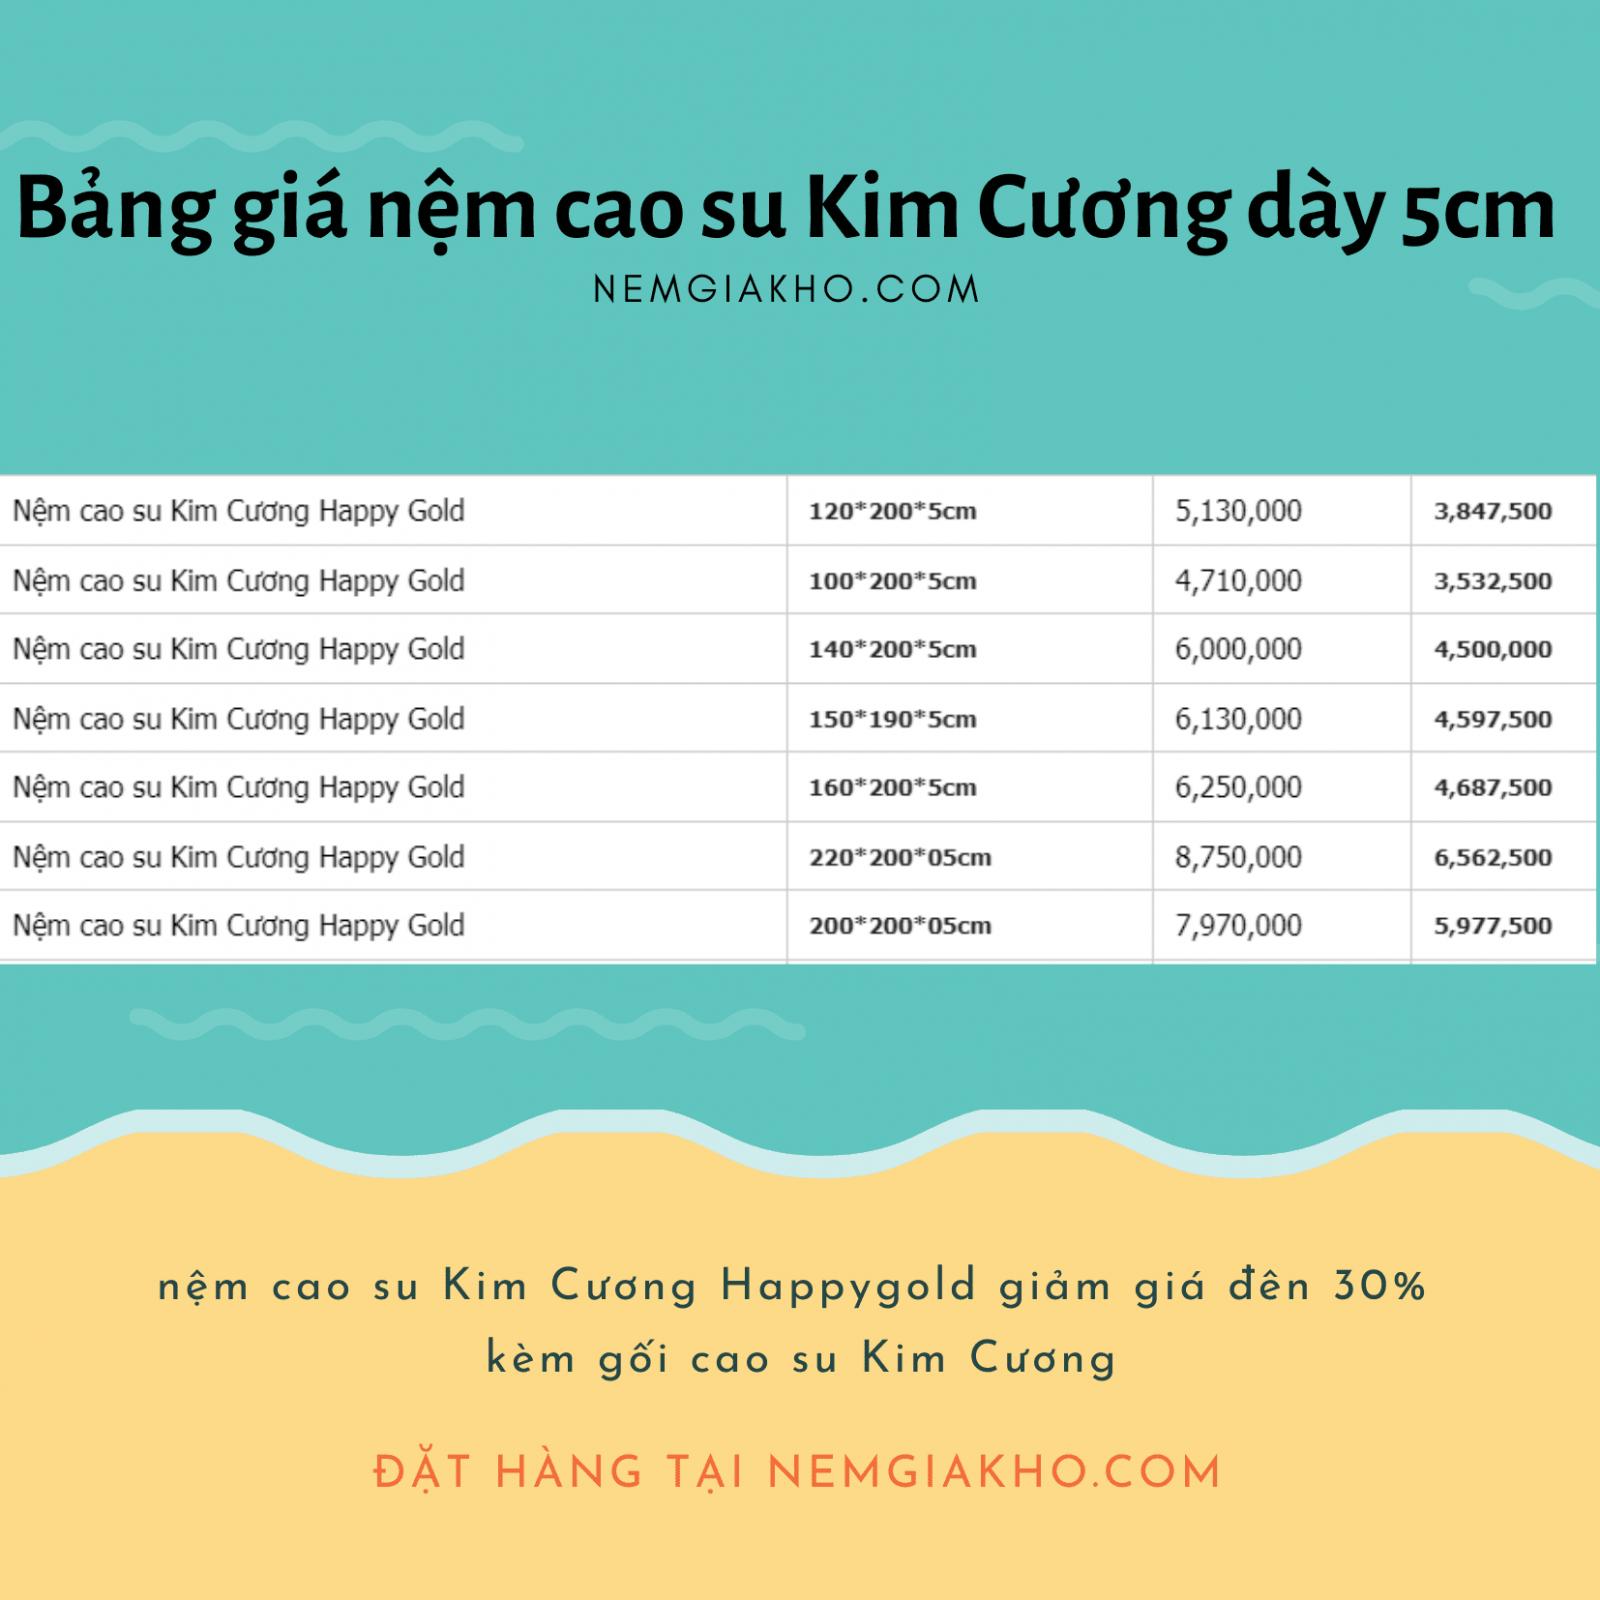 nem cao su kim cuong happy gold 5cm